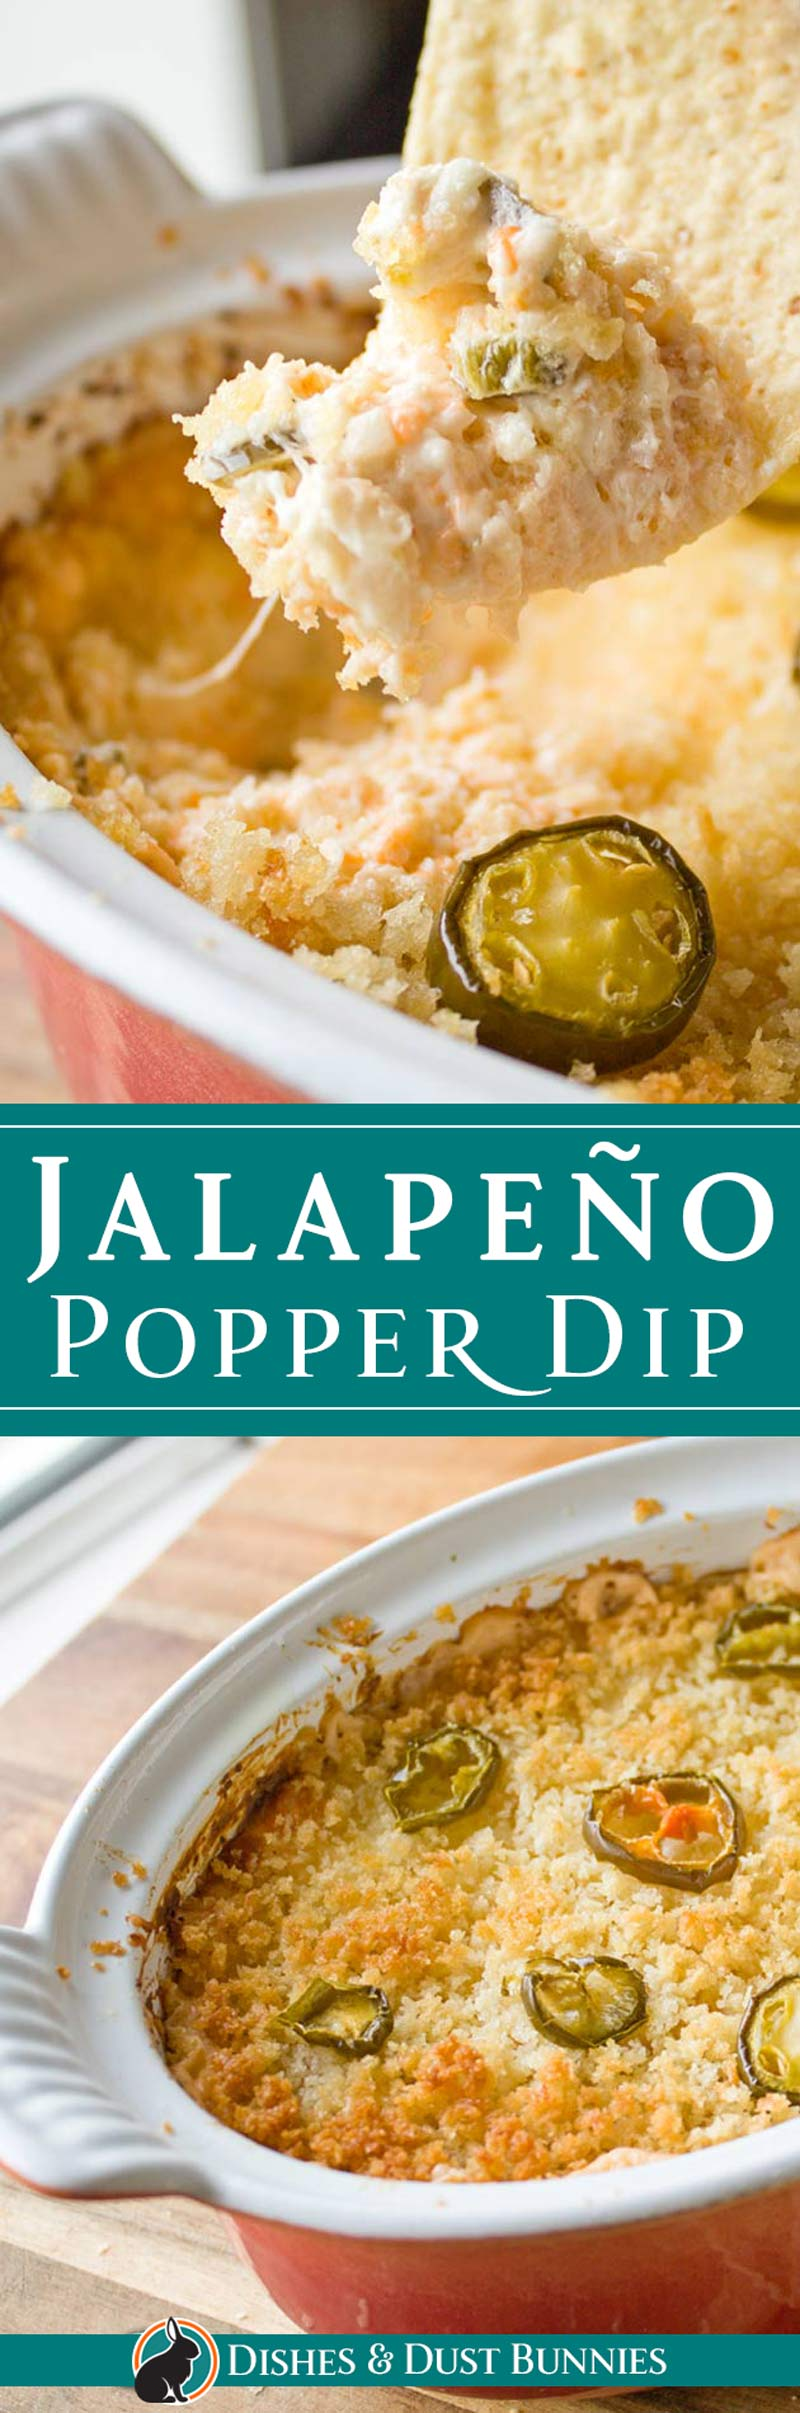 Jalapeno Popper Dip from dishesanddustbunnies.com